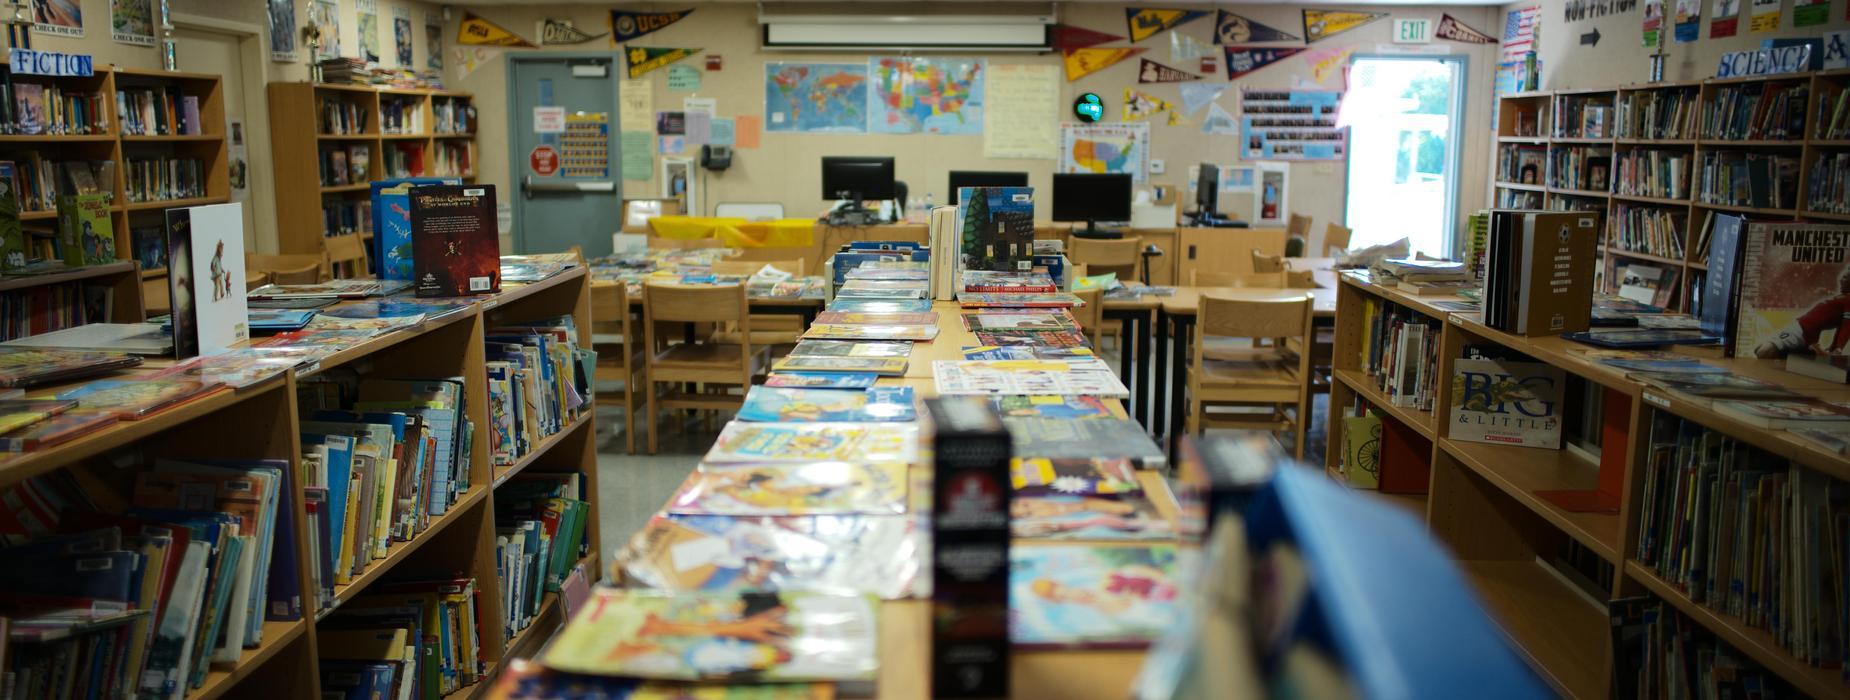 Northrup School Library